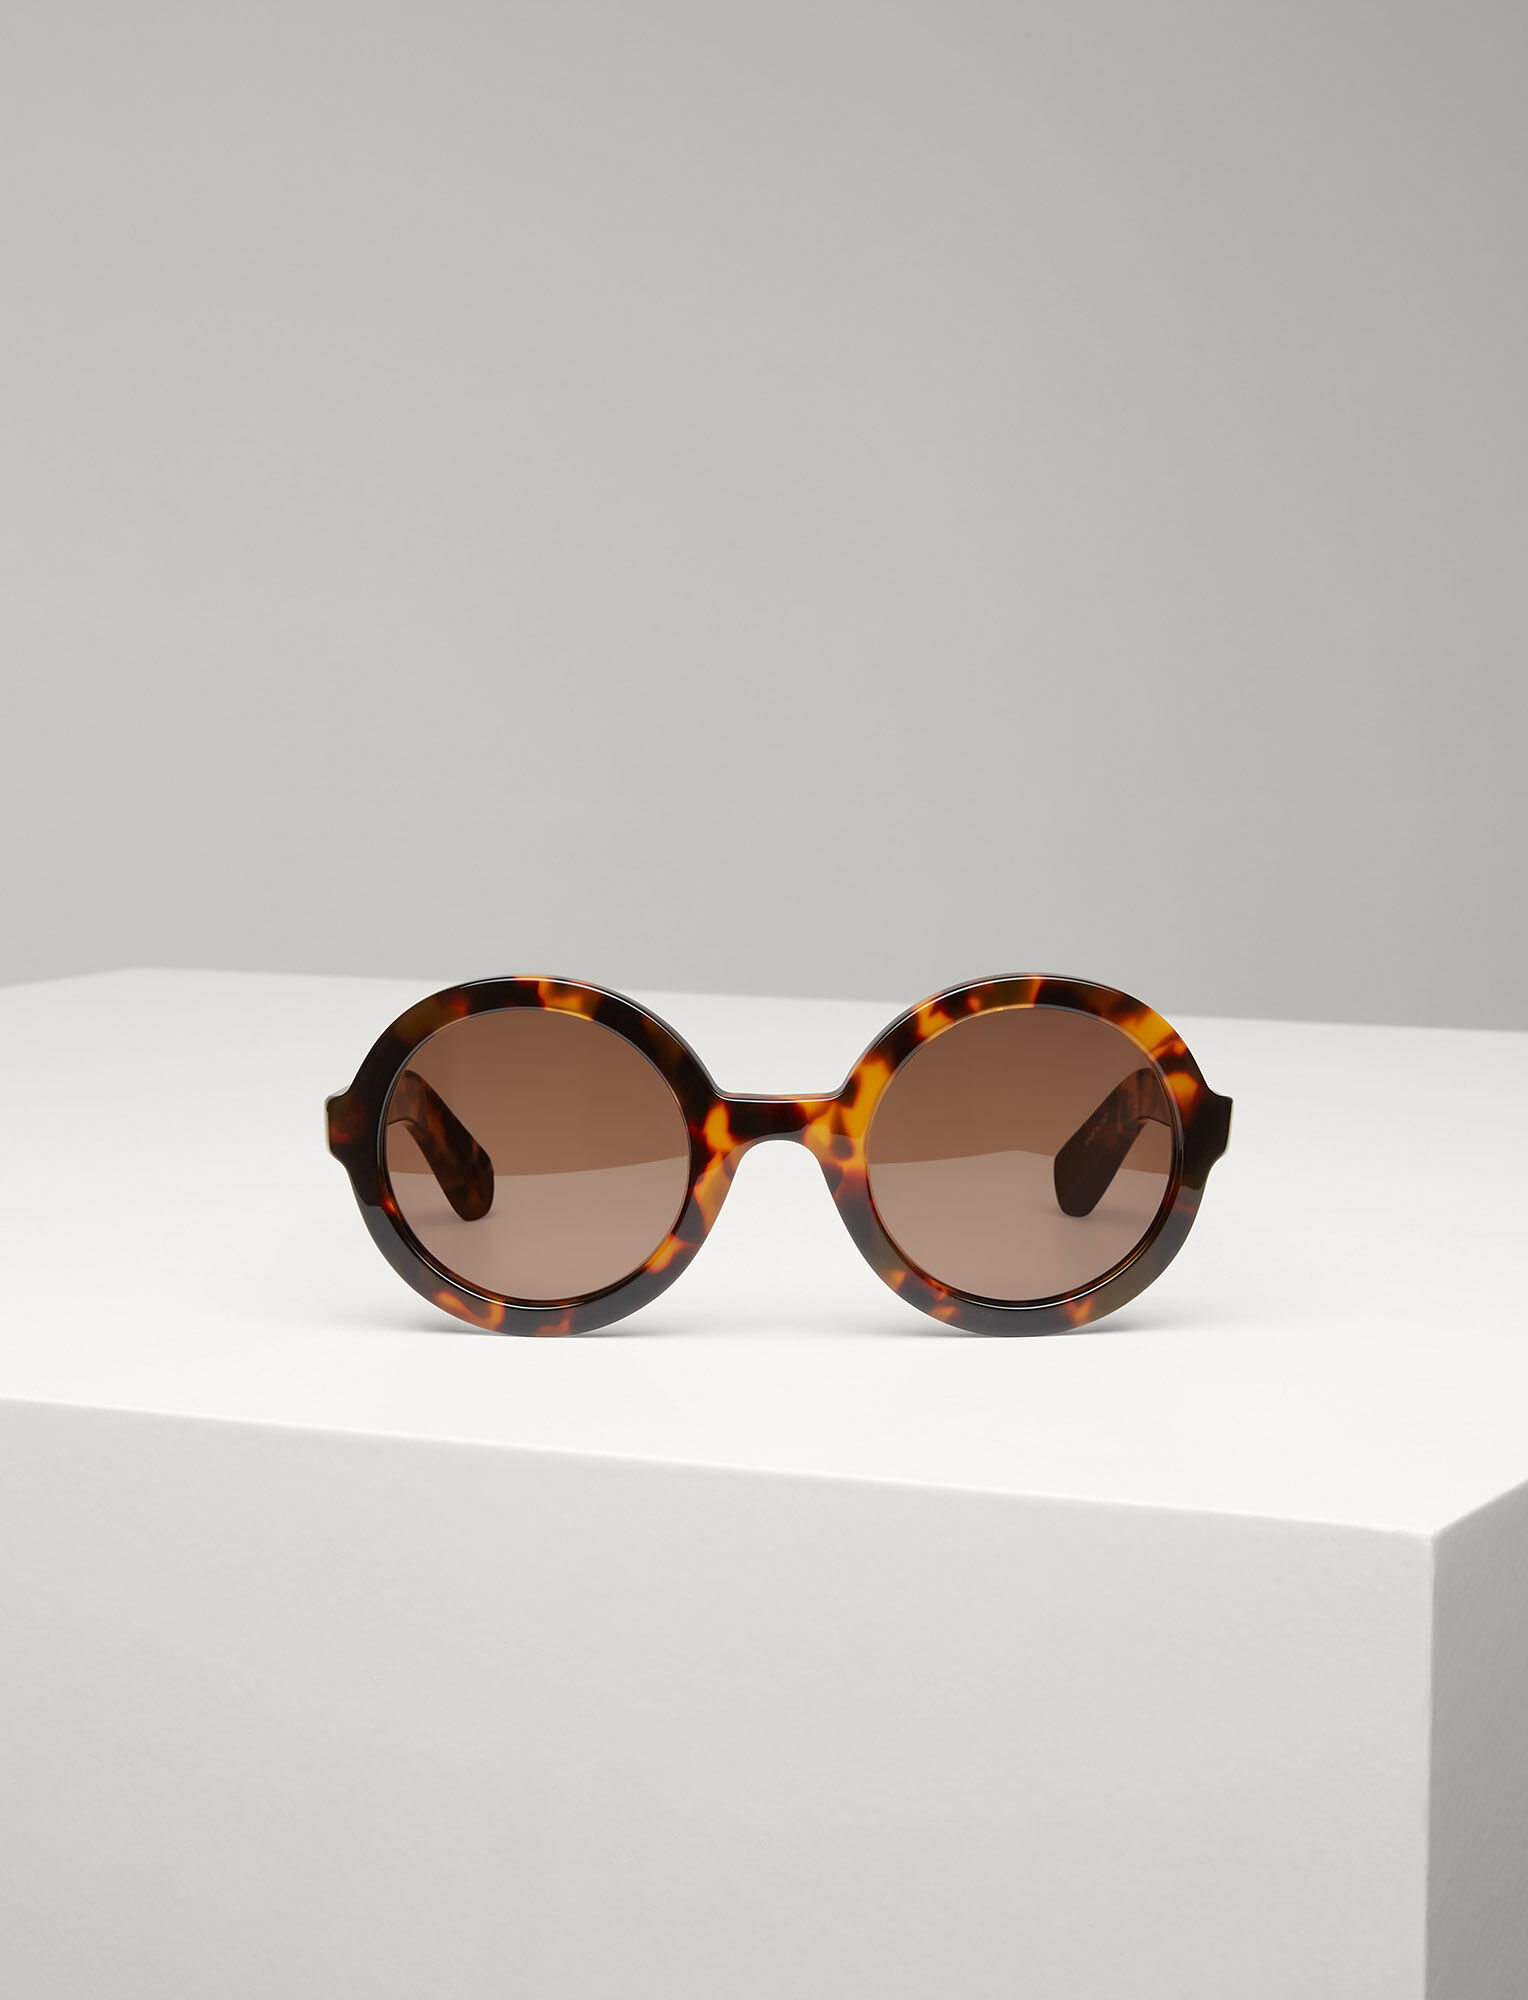 Joseph, Brook Sunglasses, in LIGHT TORTOISE